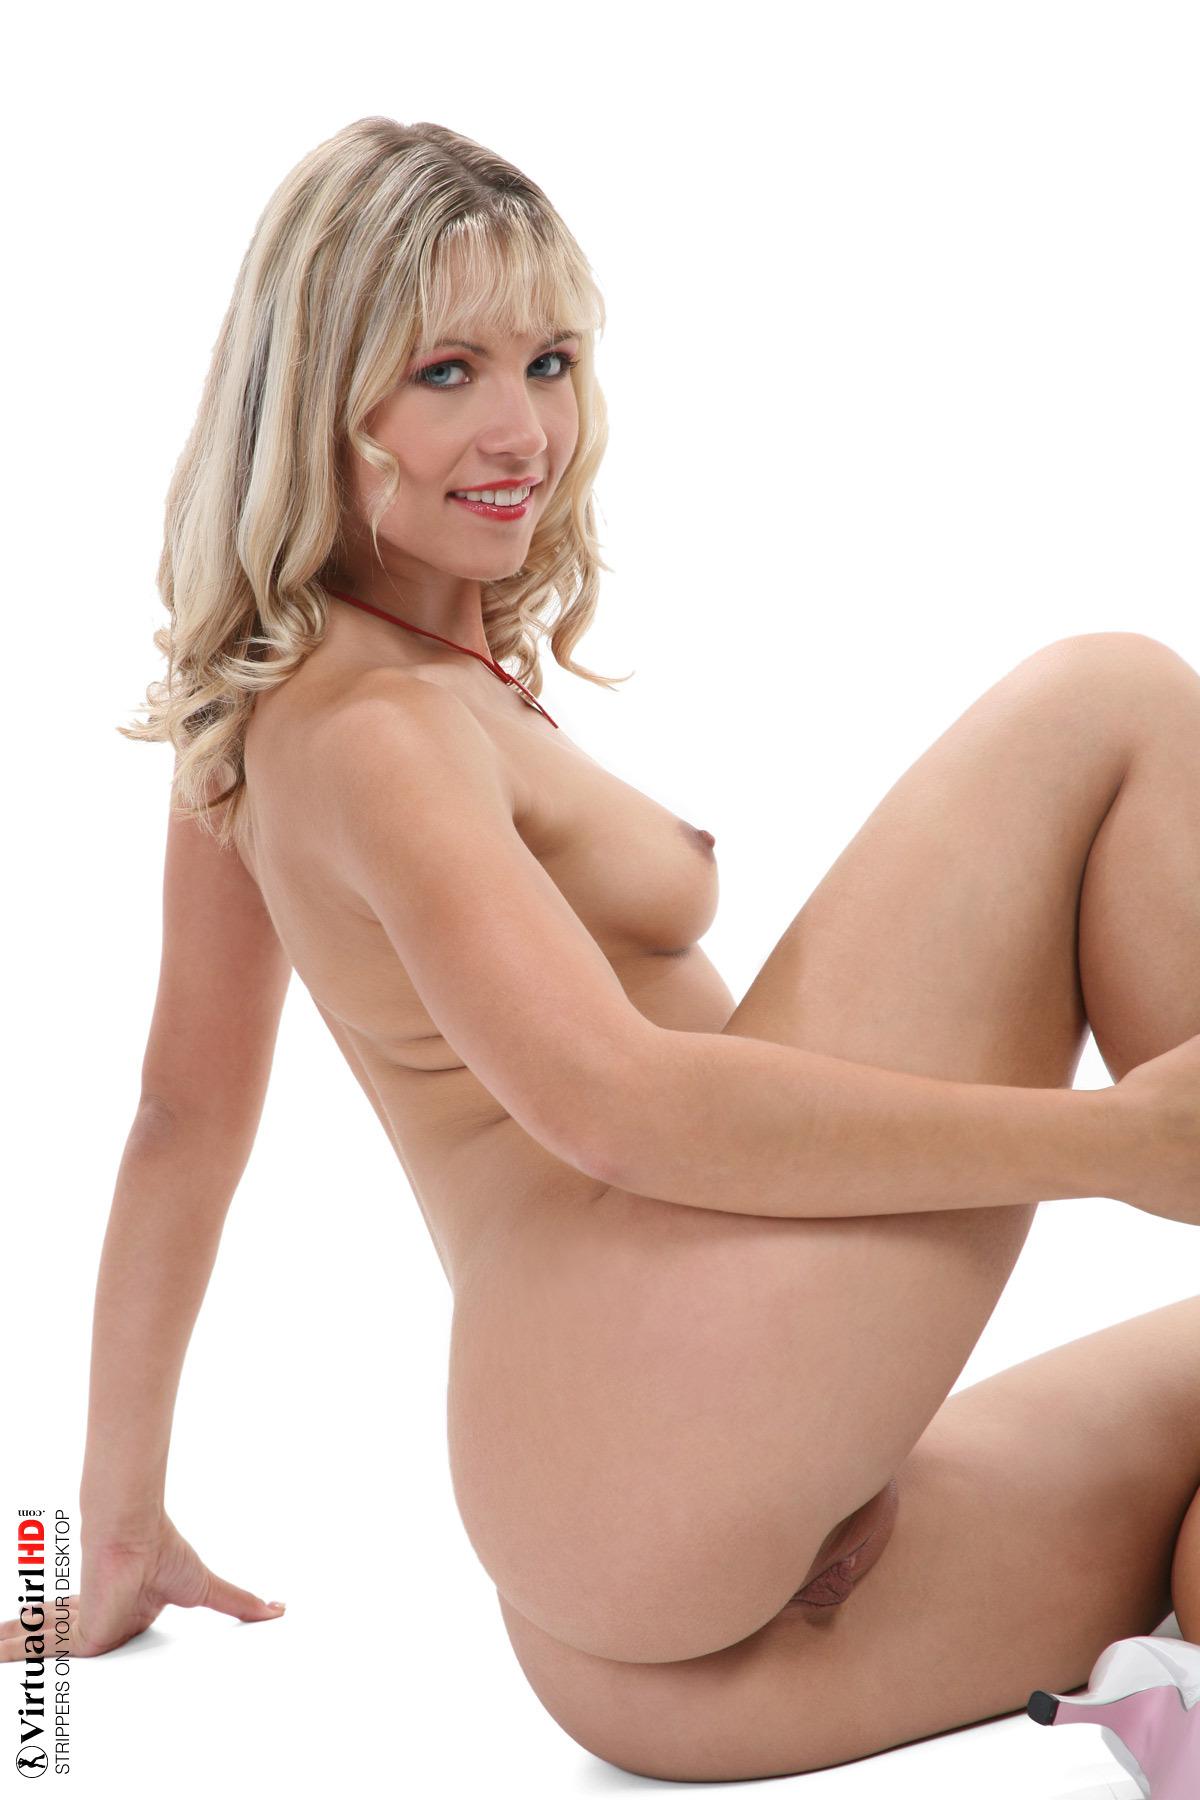 nude women phone wallpaper